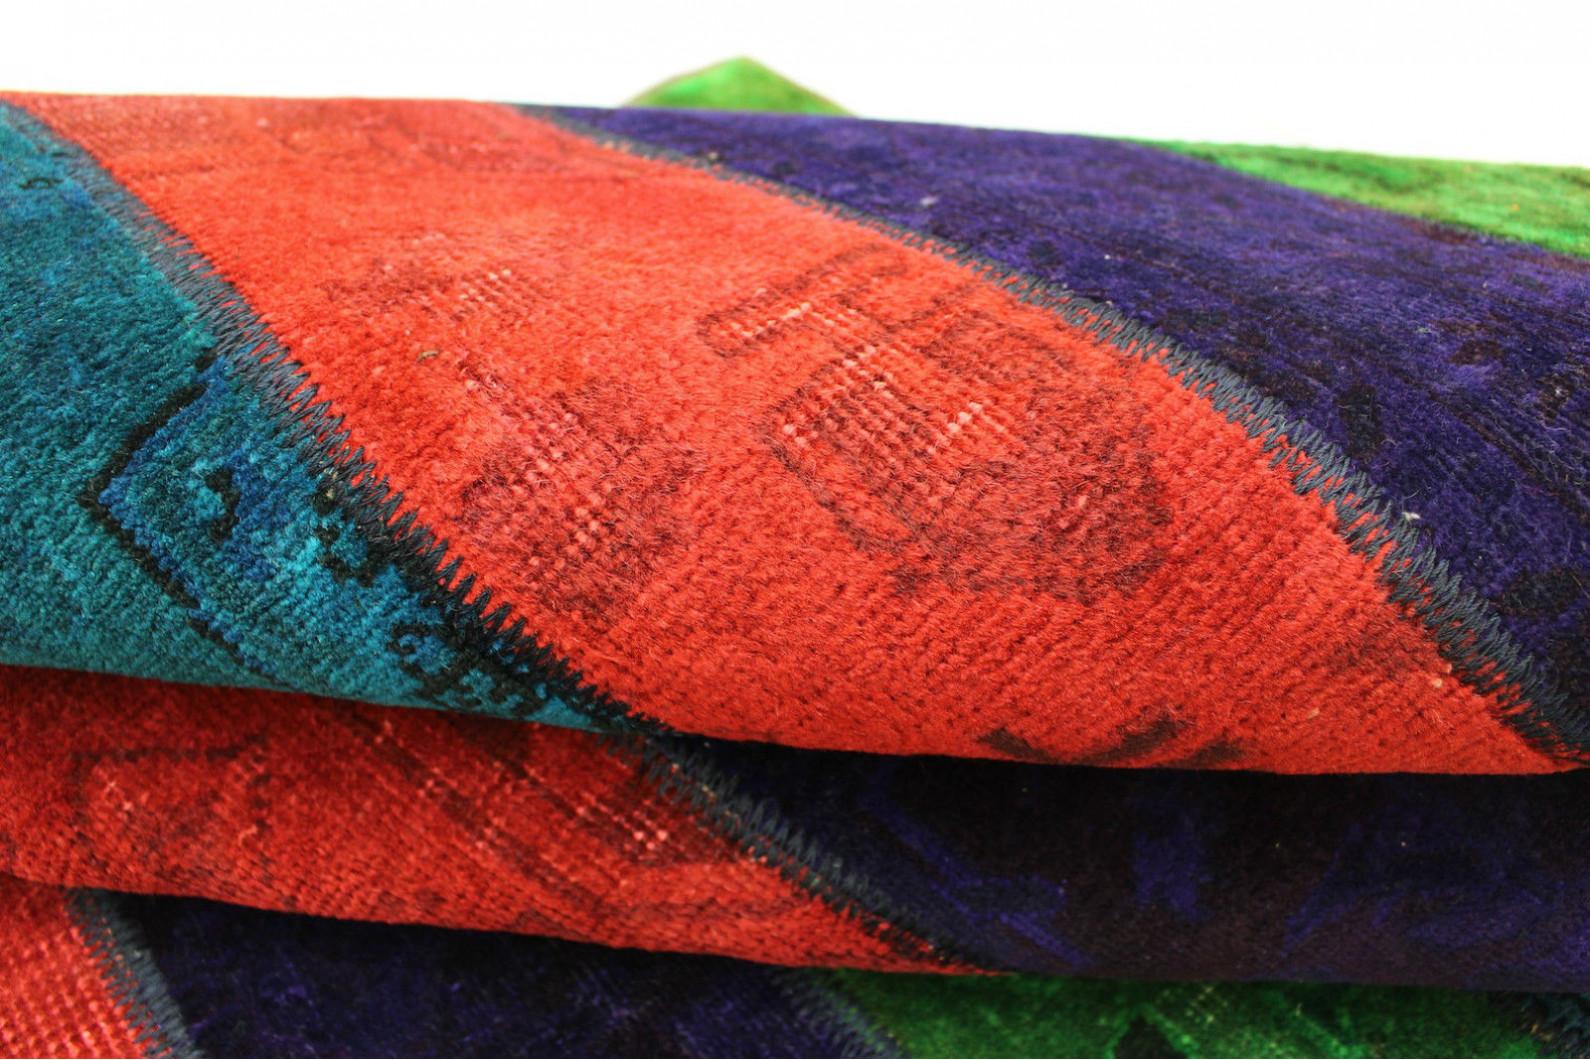 patchwork teppich rot lila blau in 240x170cm 1001 2562 bei kaufen. Black Bedroom Furniture Sets. Home Design Ideas